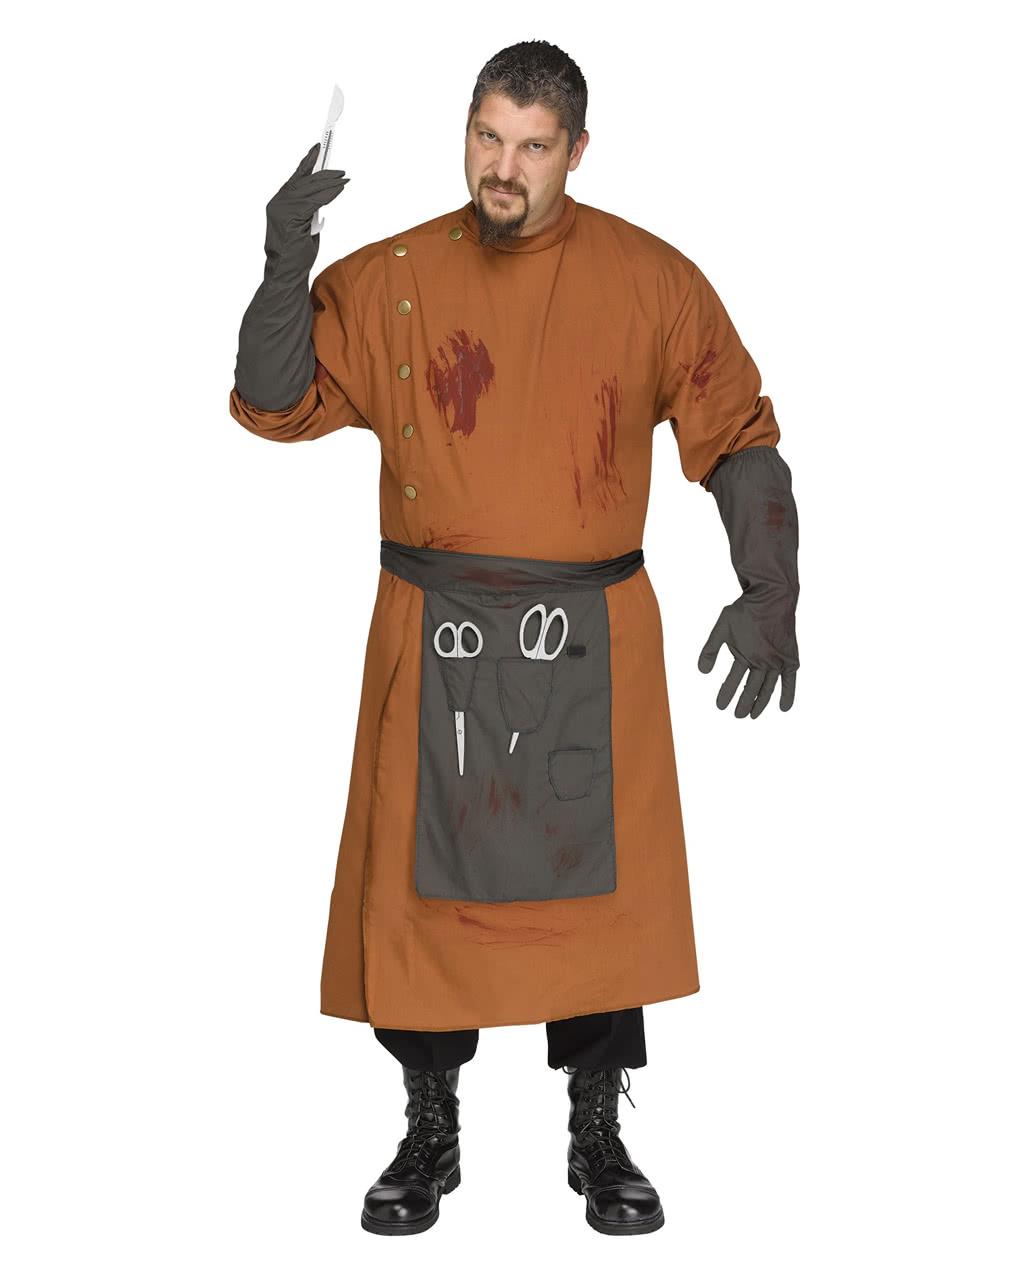 Kostum Psycho Arzt Faschings Verkleidung Karneval Universe